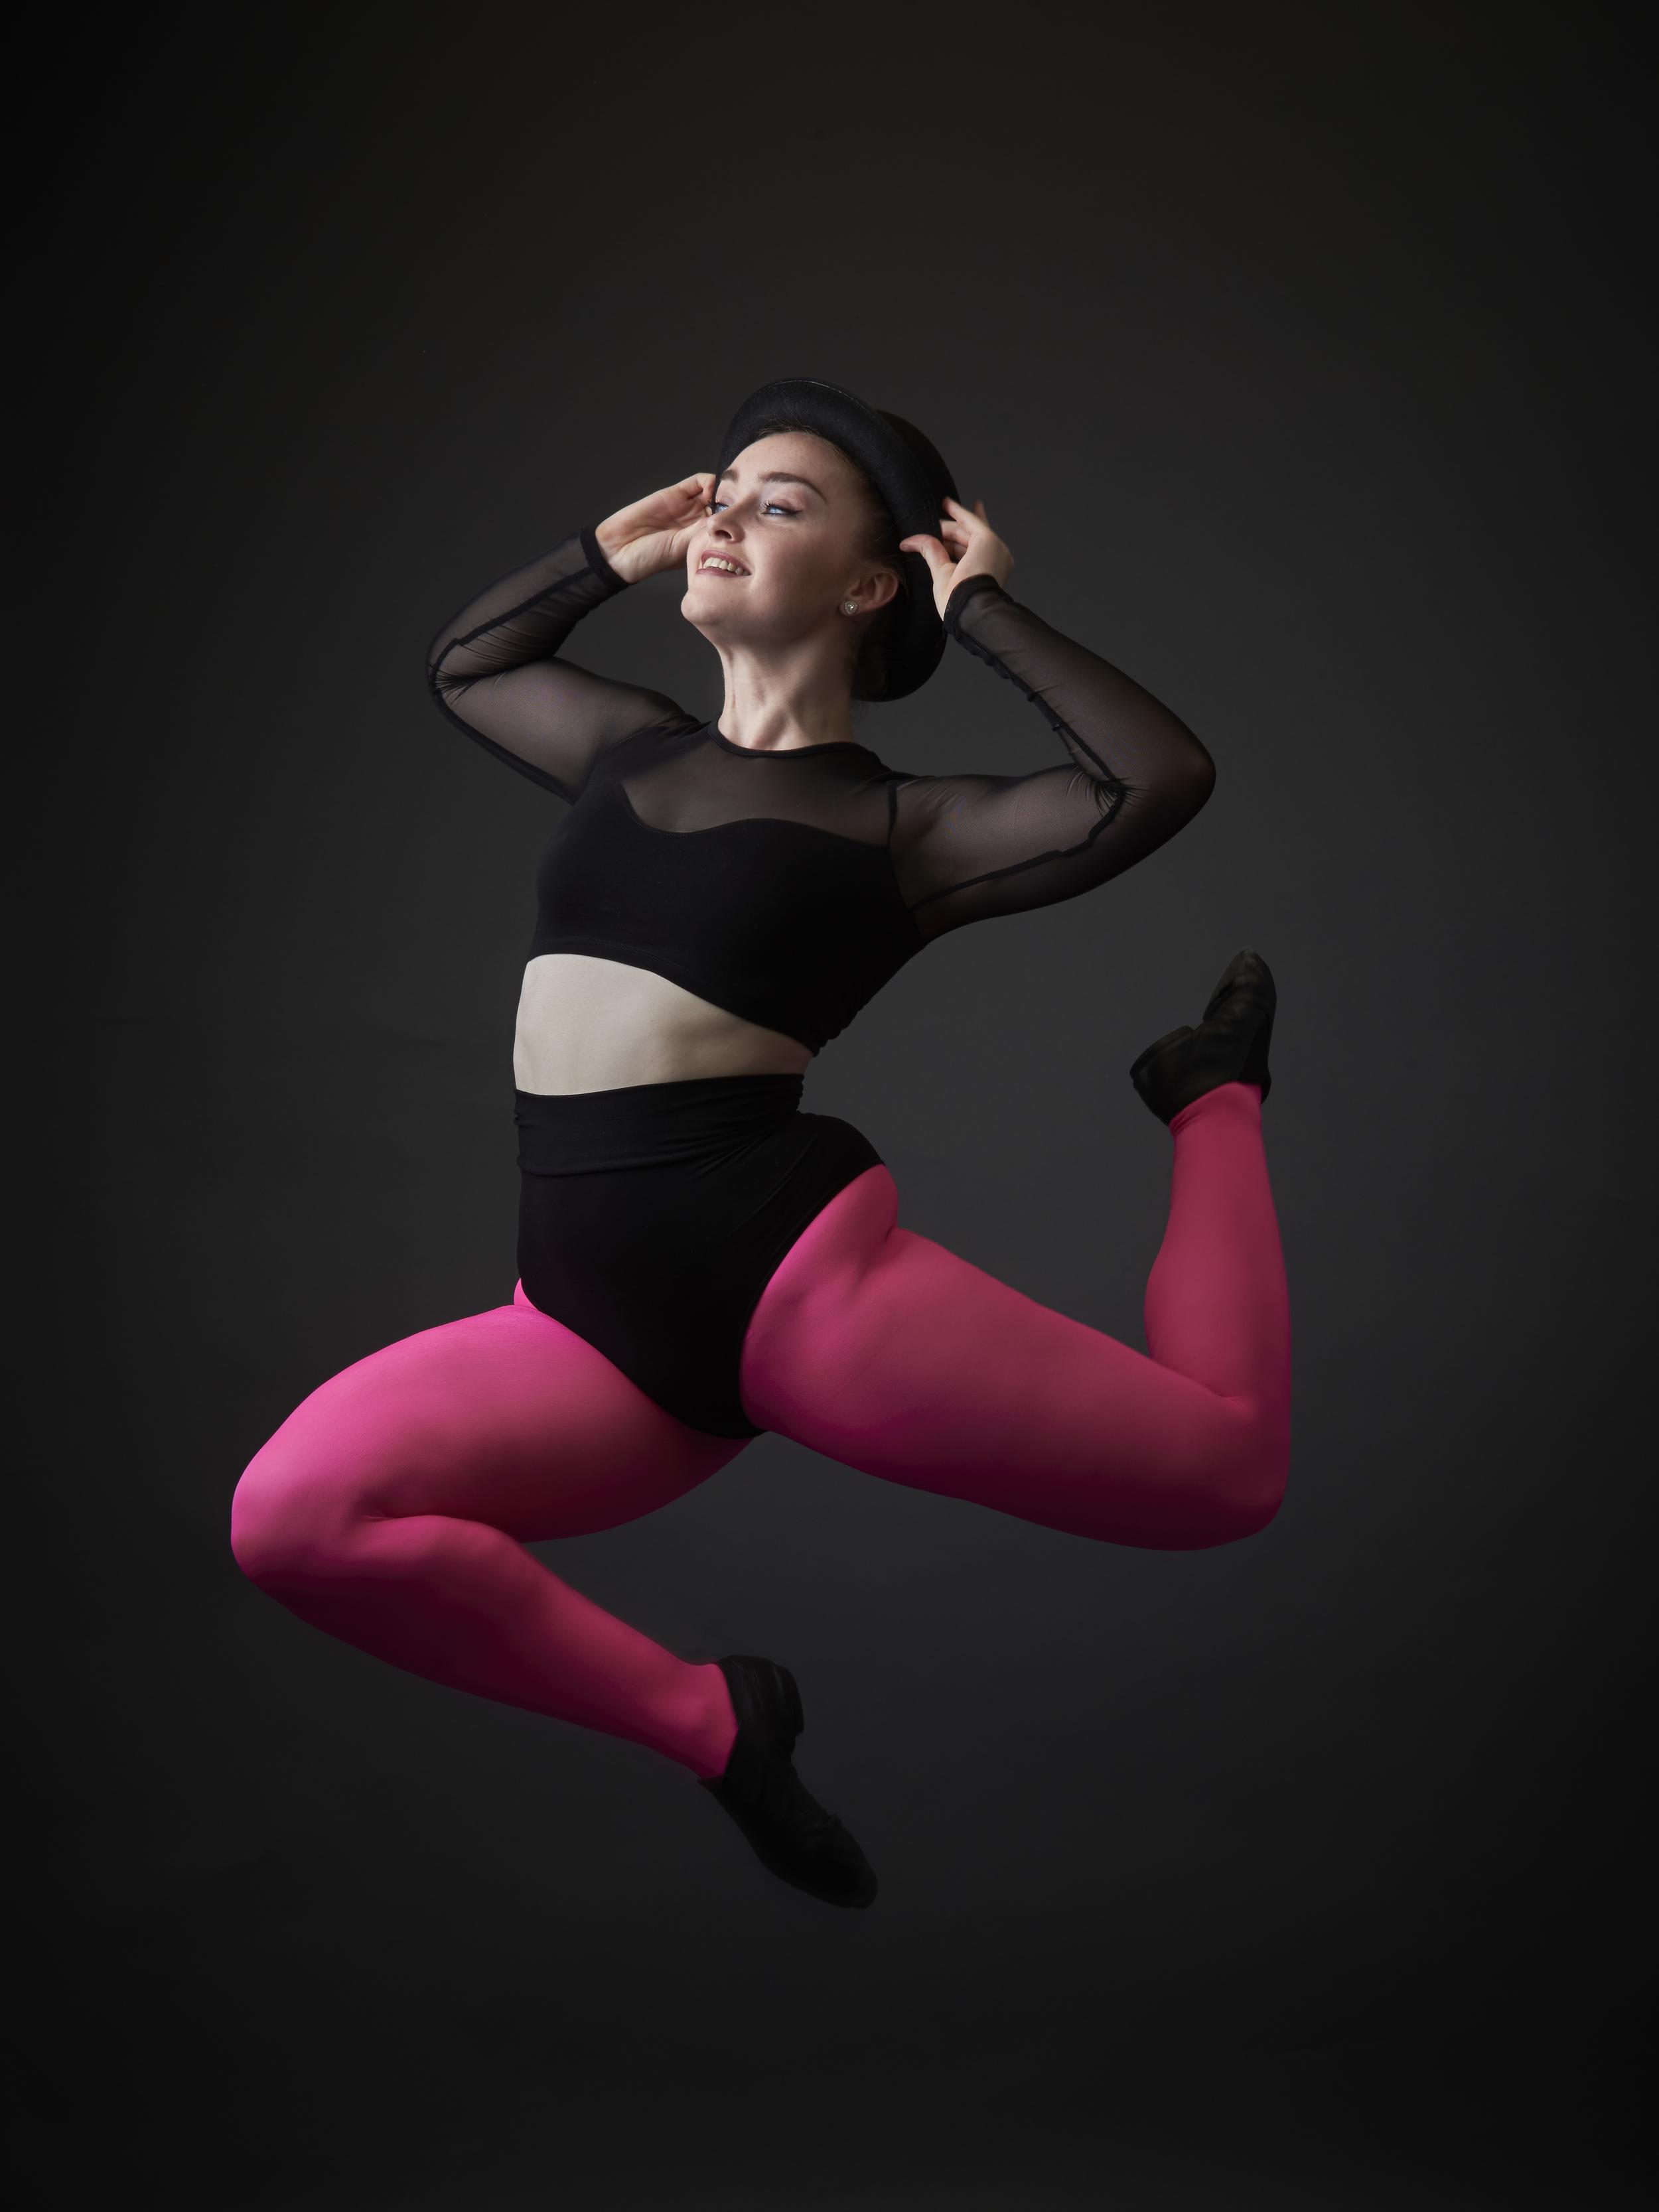 FotoFun Elise Phillipi Ballet_DSC2834_PSD_HR.jpg